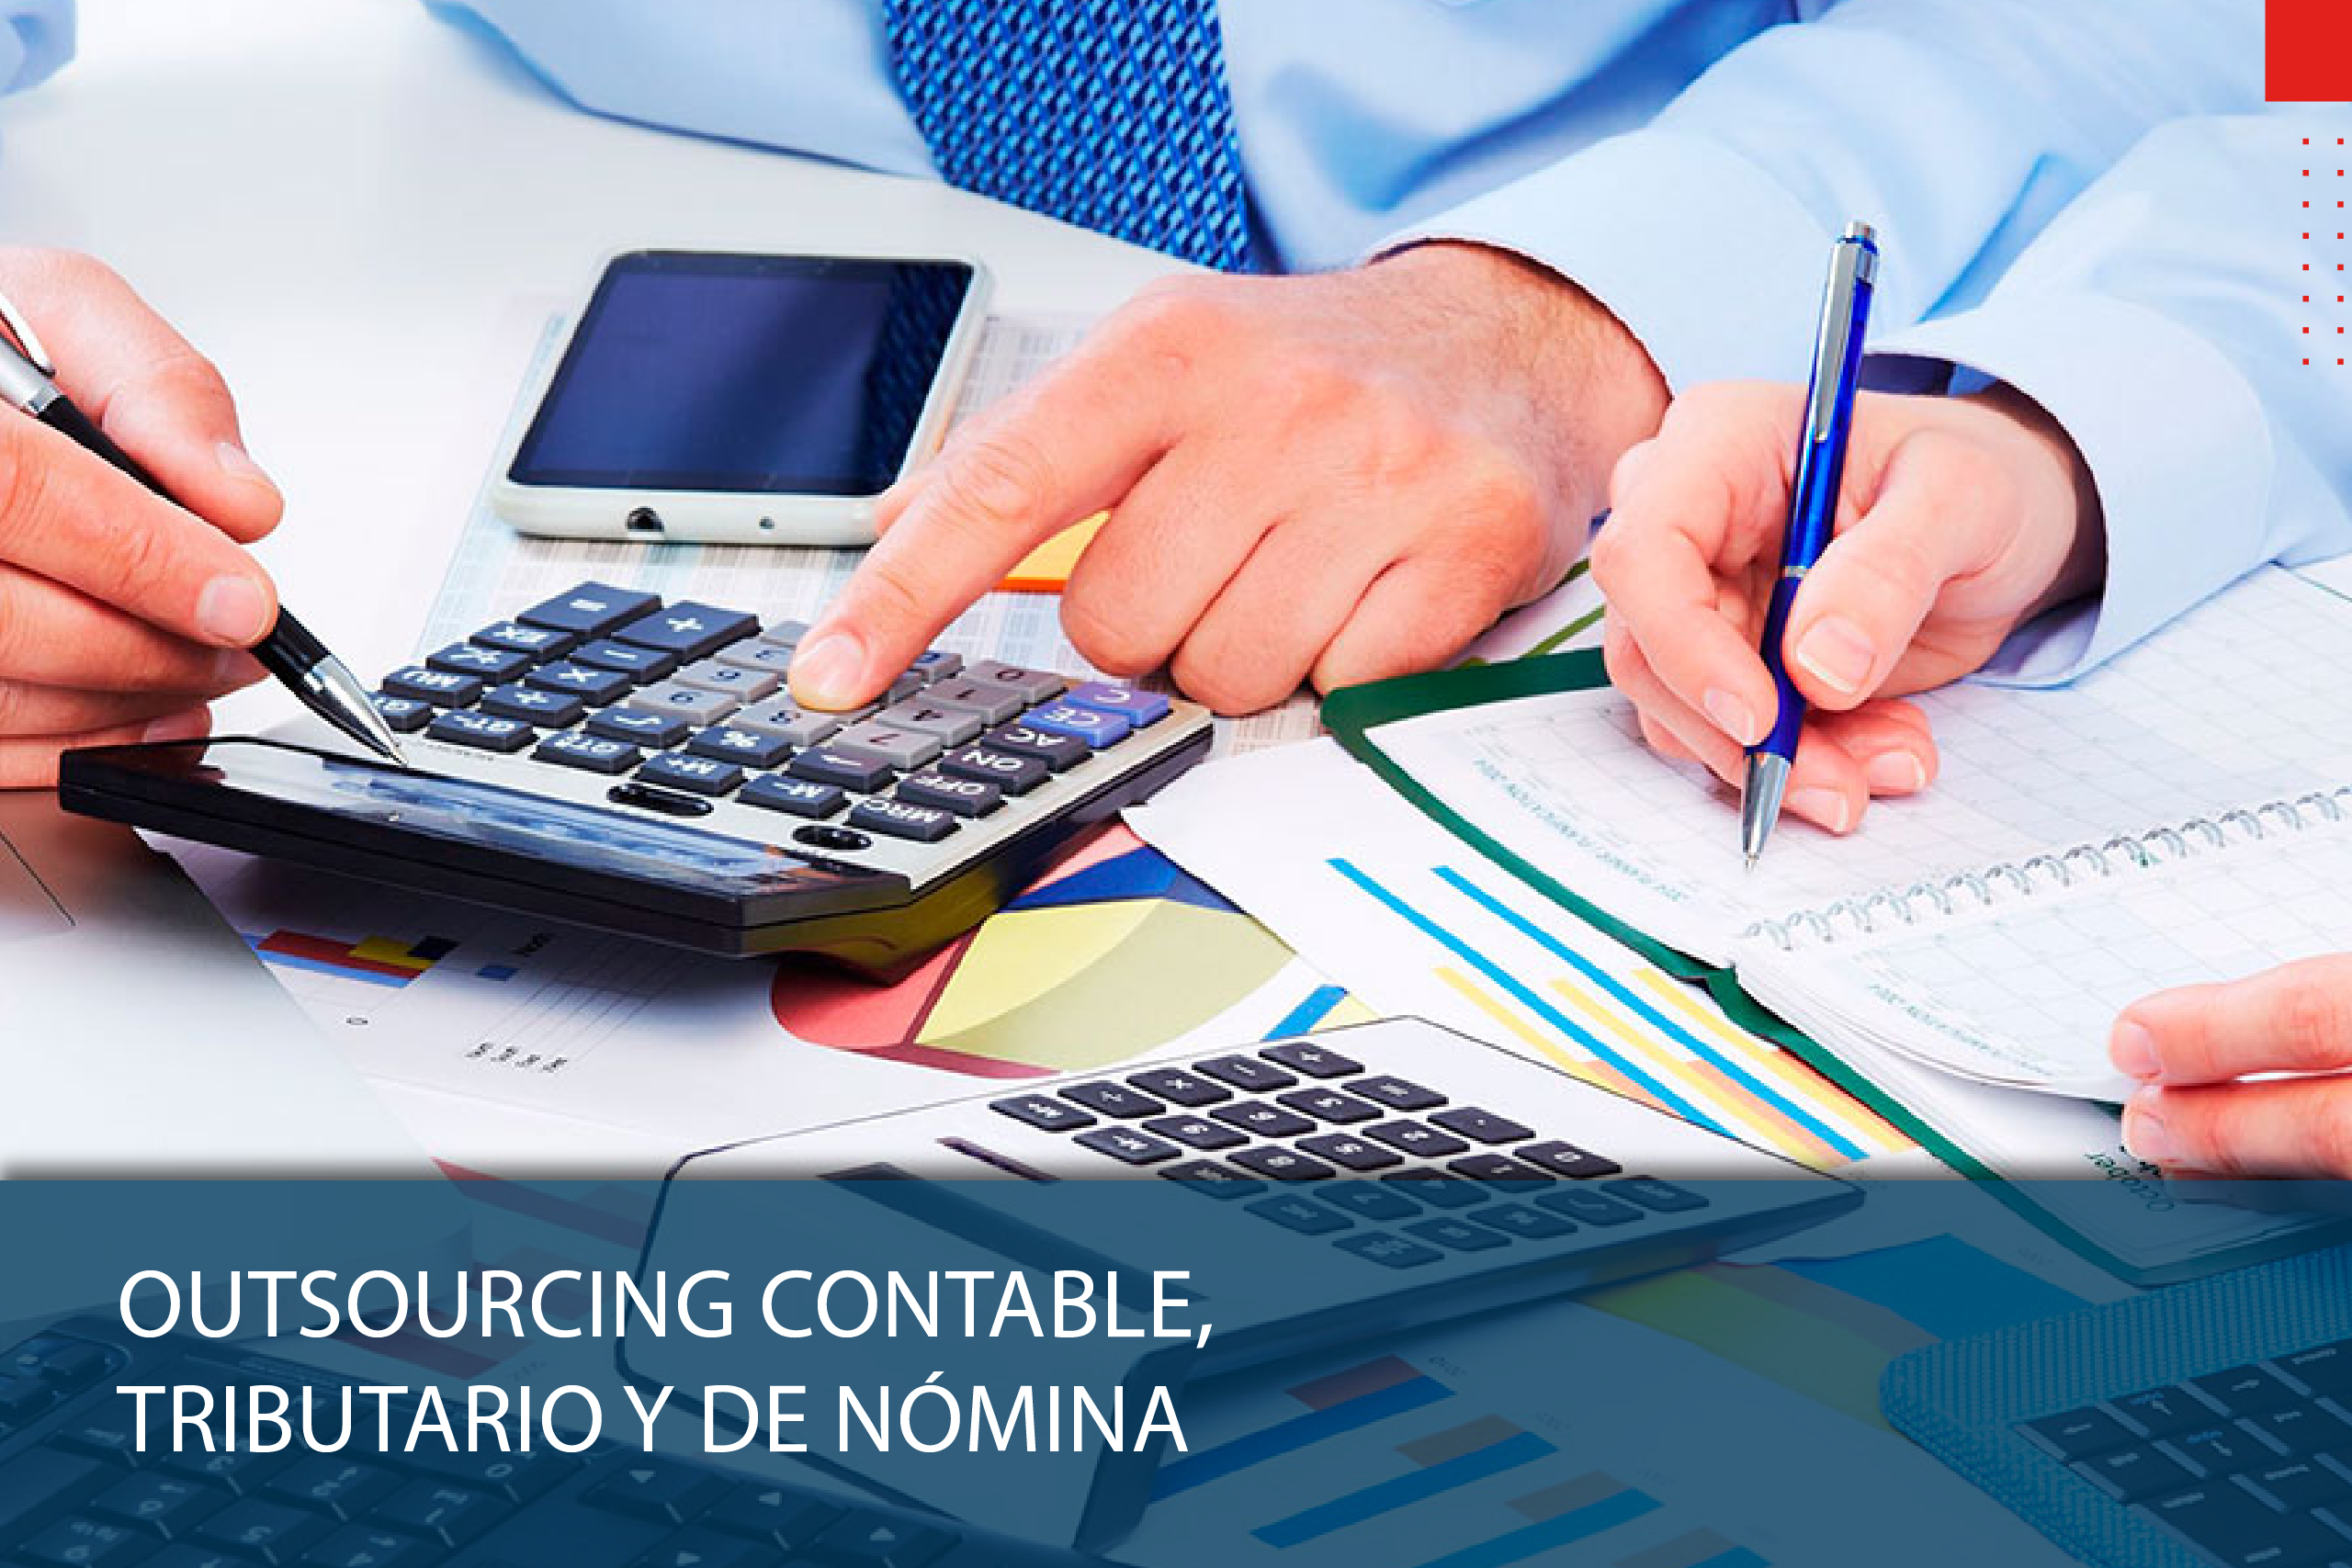 Outsourcing contable, tributario y de nómina